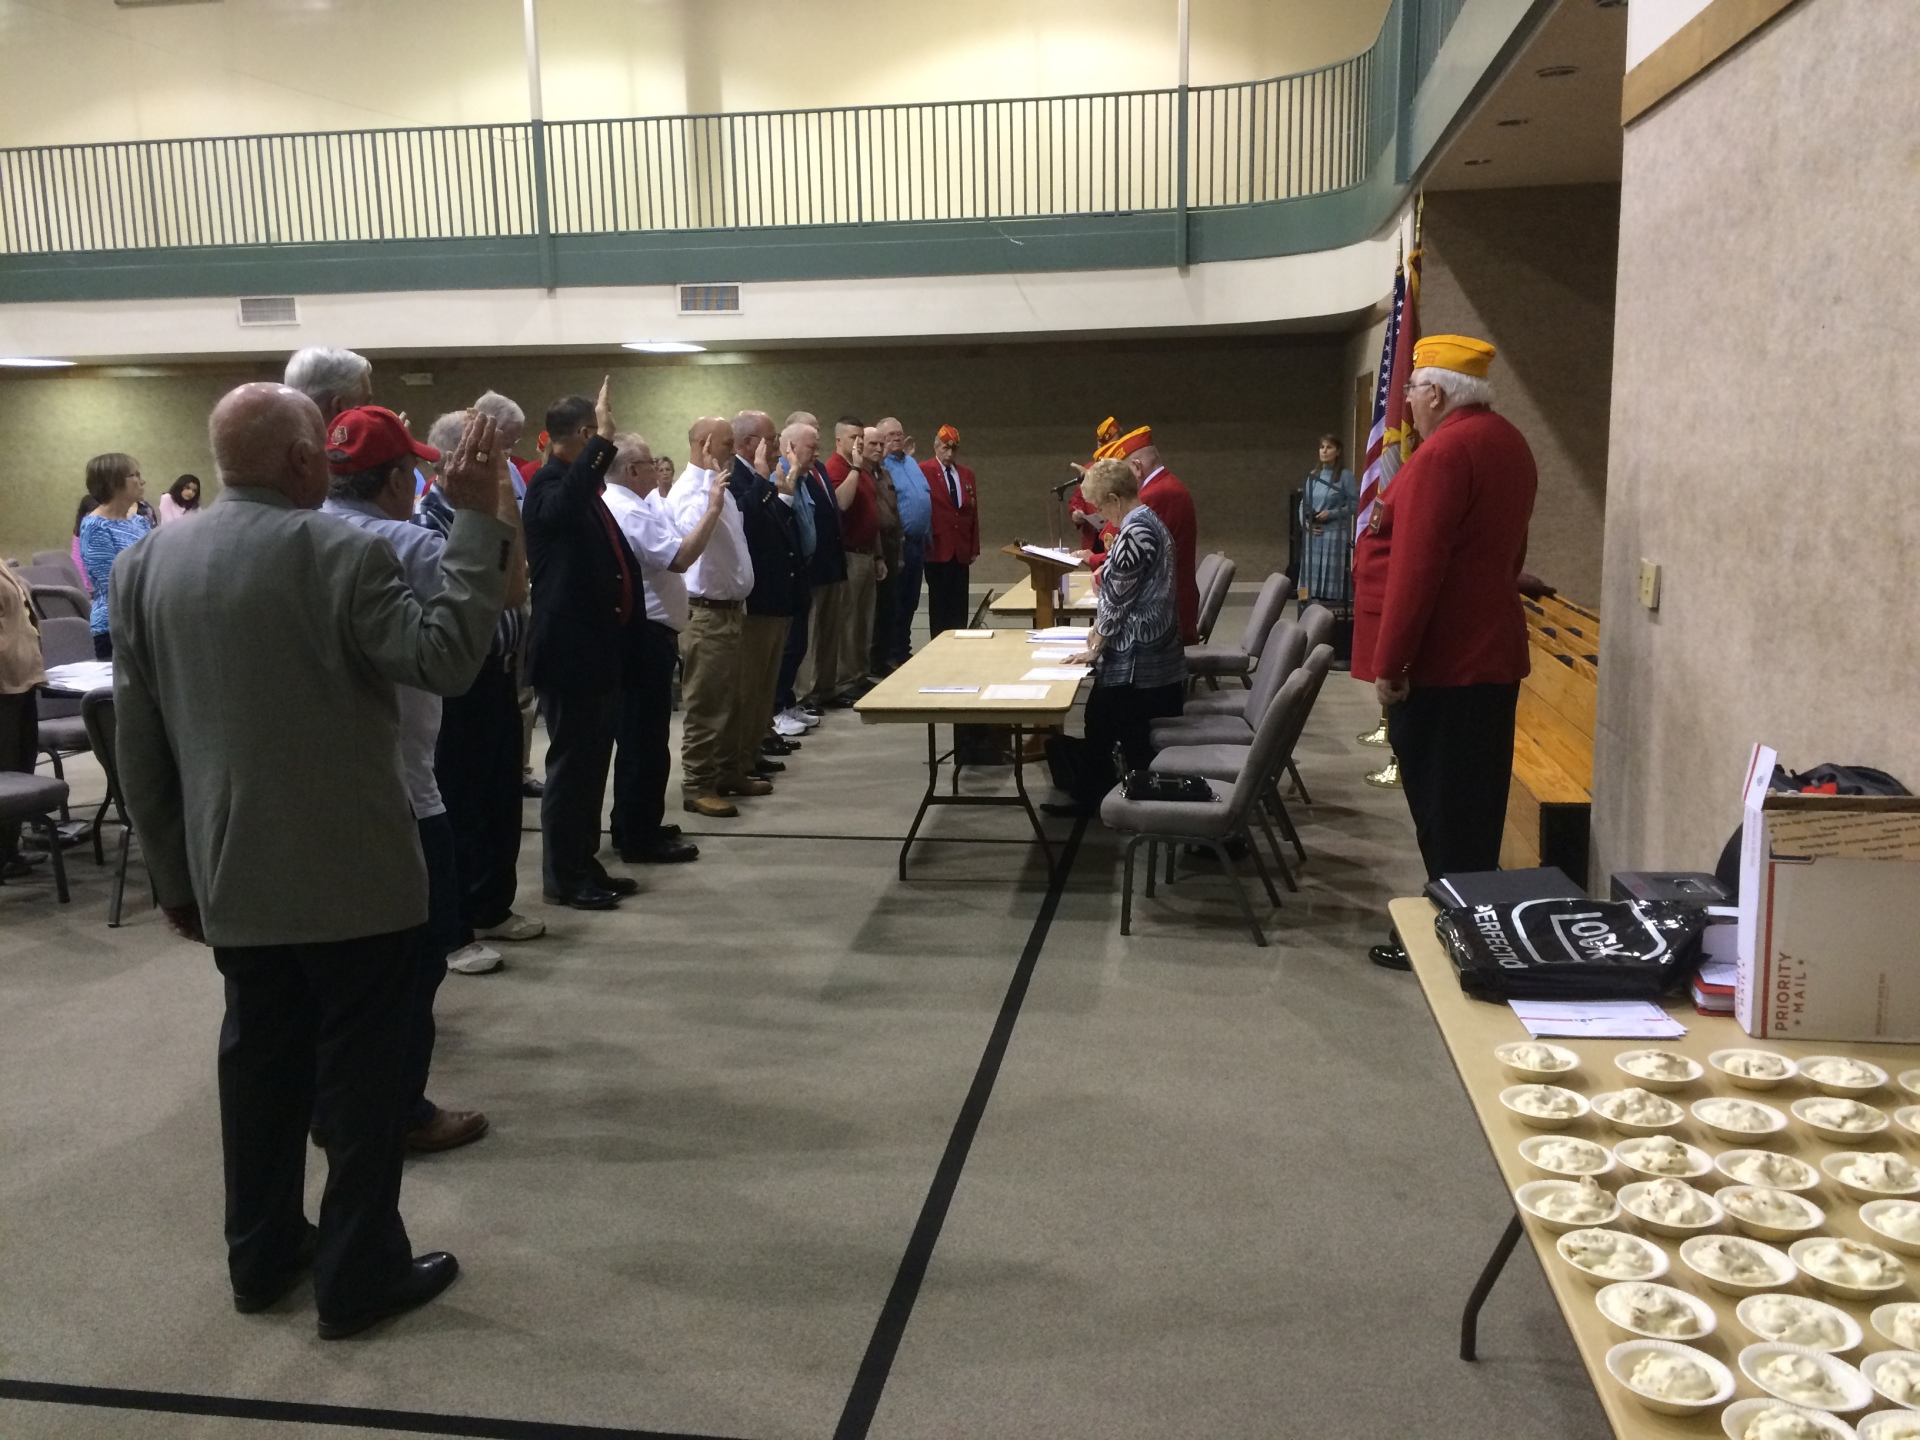 Opening Ceremonies of the Houston County Detachment